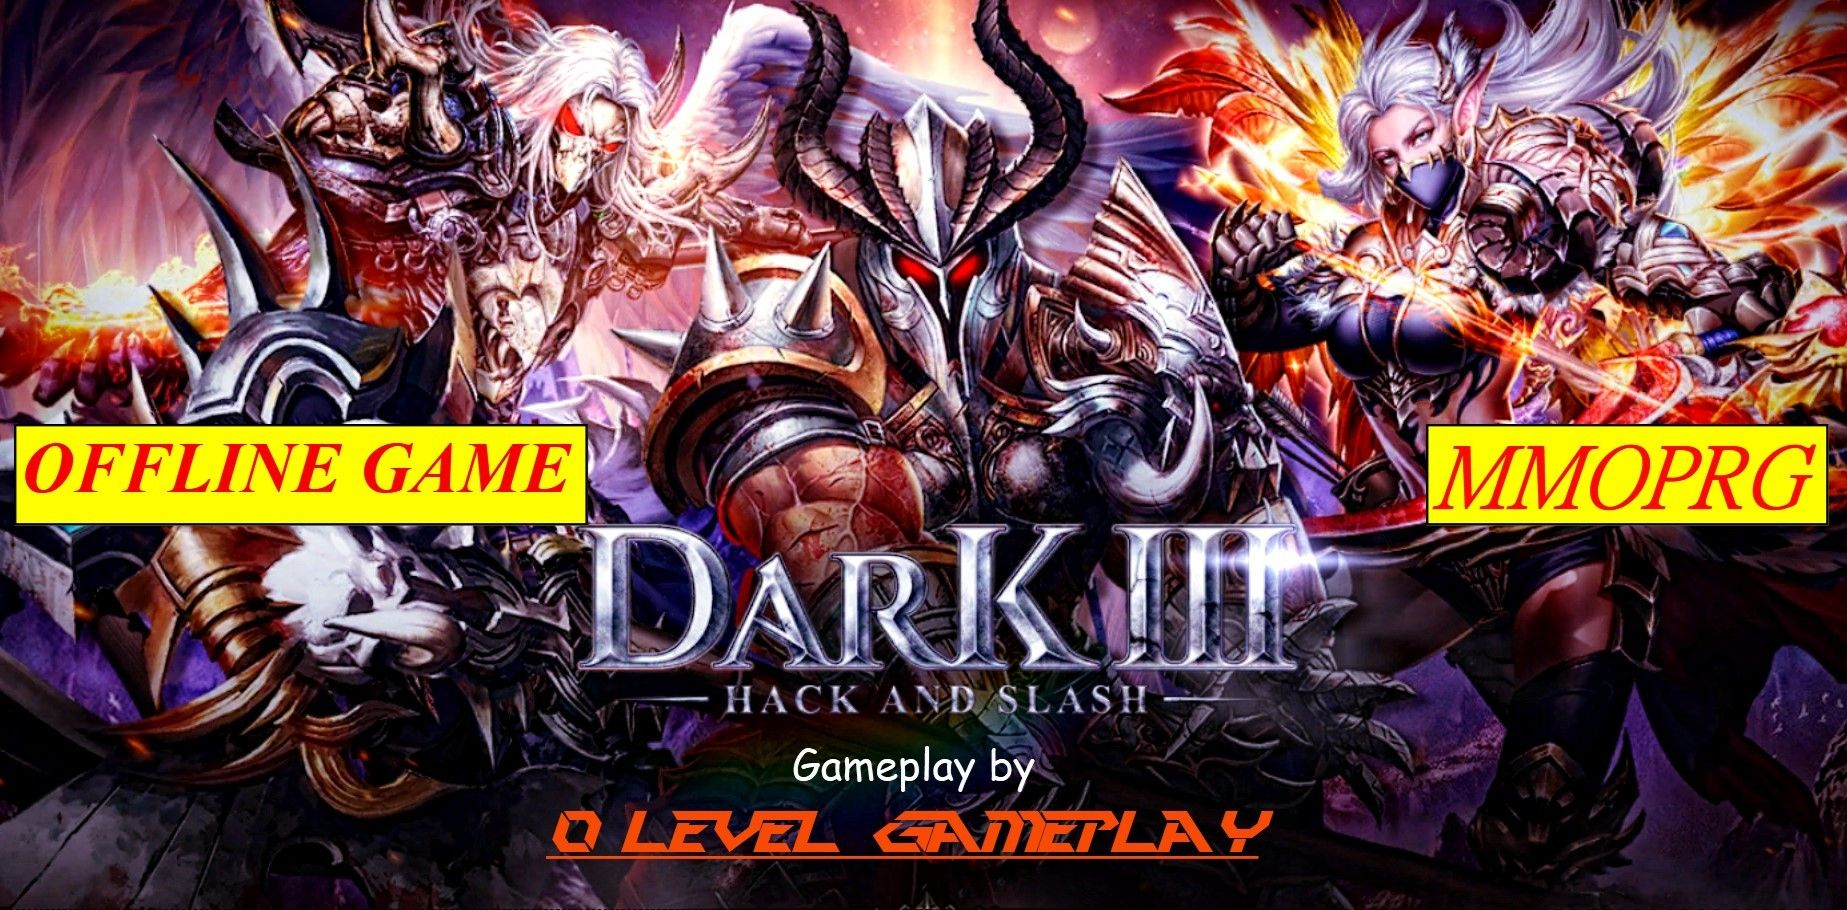 Dark 3 Hack and Slash Gameplay (iOS Android) dark3